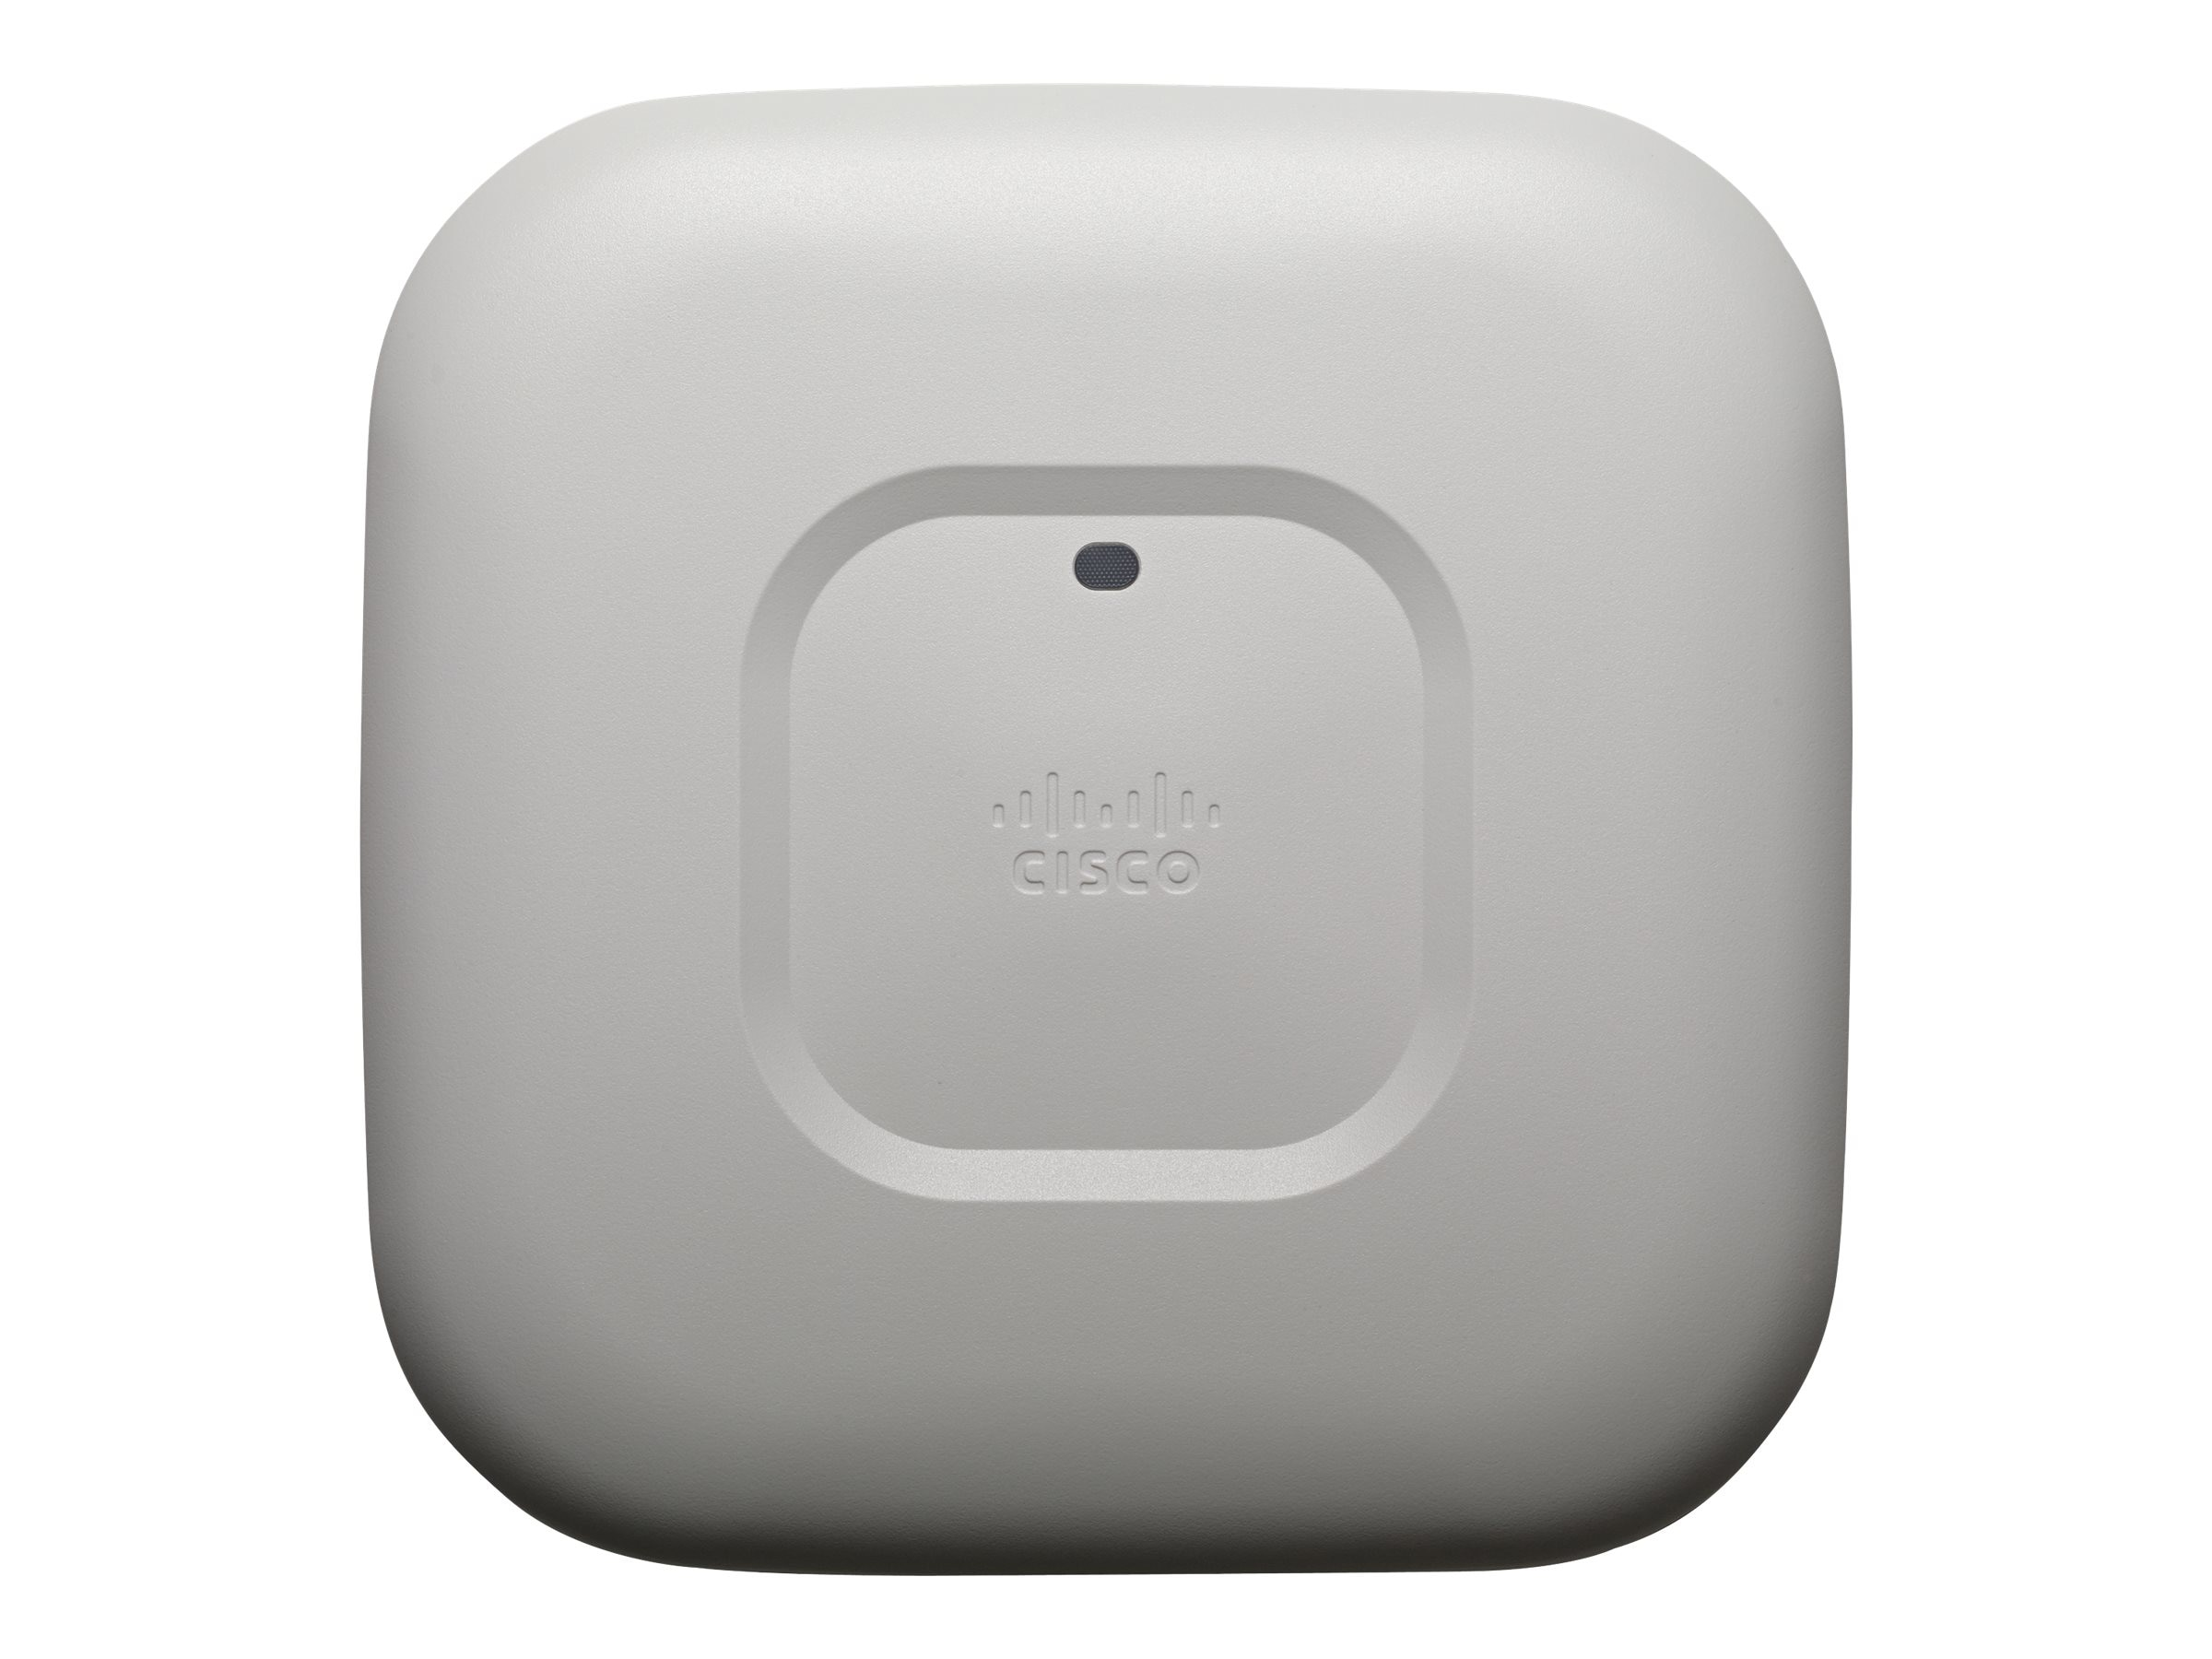 Cisco AIR-CAP1702I-ZK910 Image 2